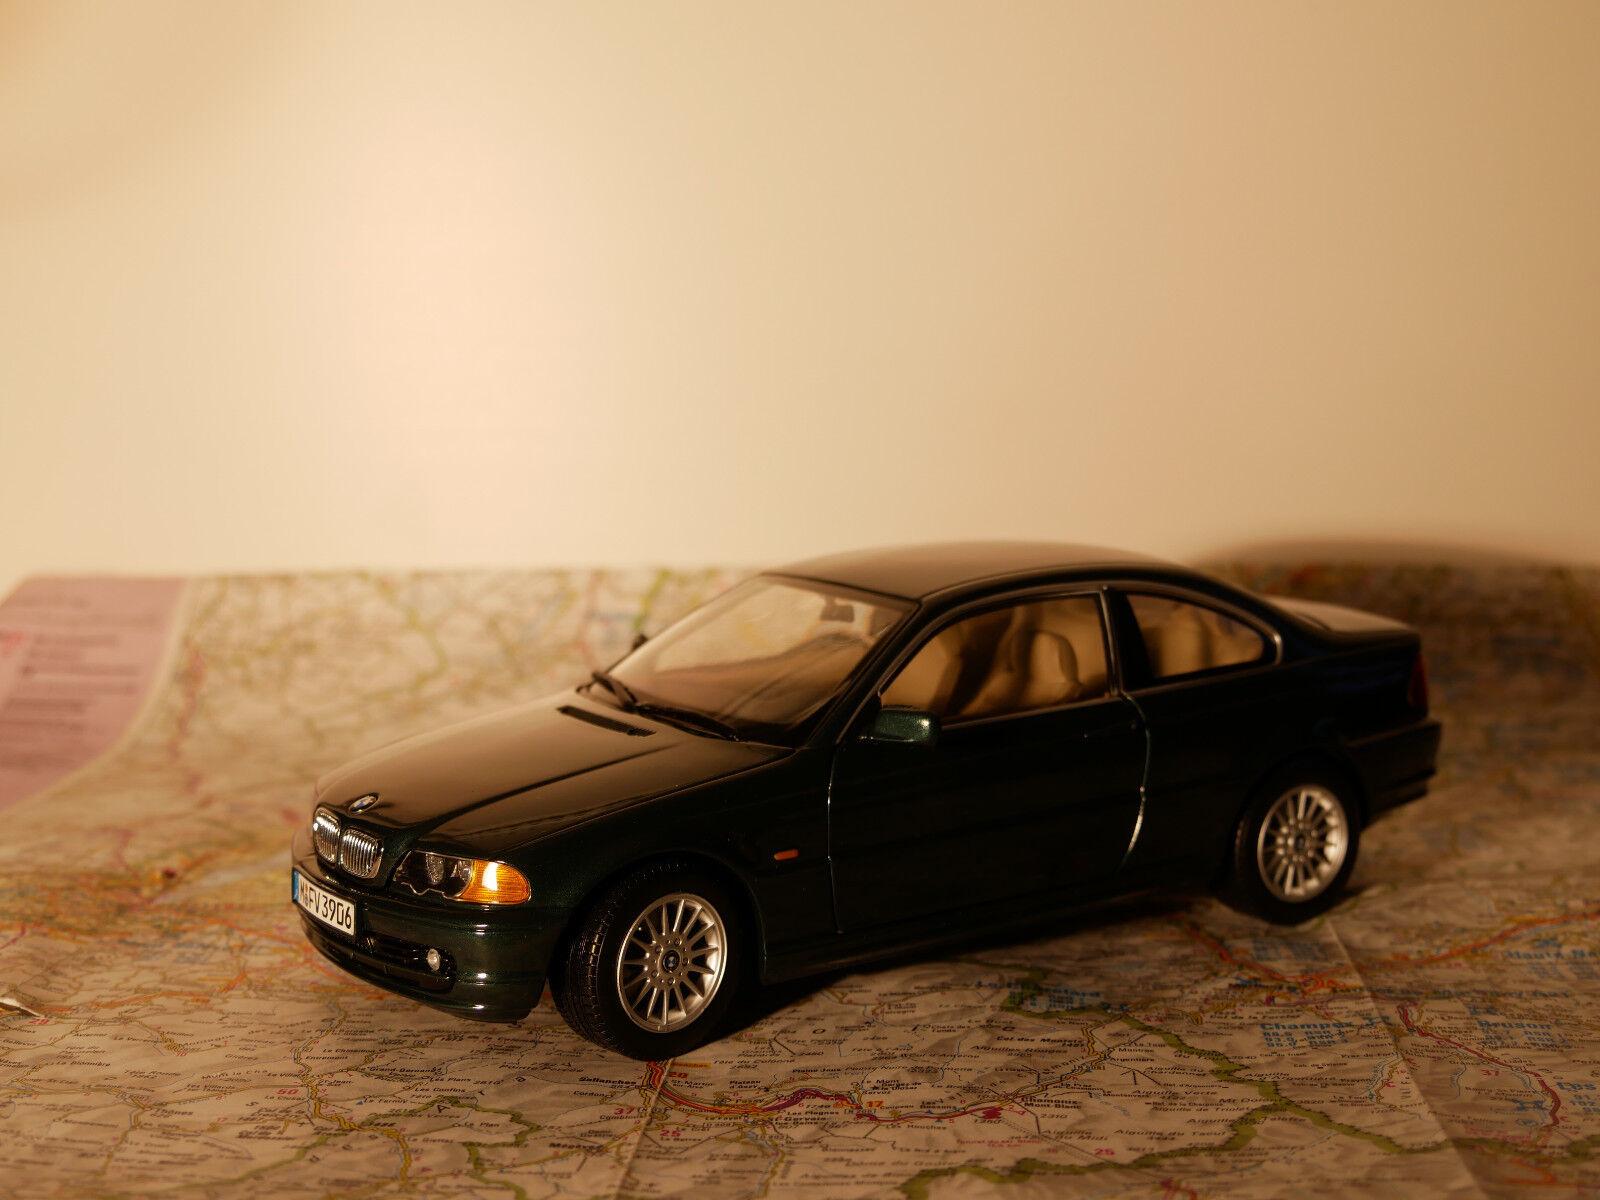 KYOSHO BMW 328Ci vert  ART.80439411466 BWM - DEALER- VERSION + BOX  1 18  NEW